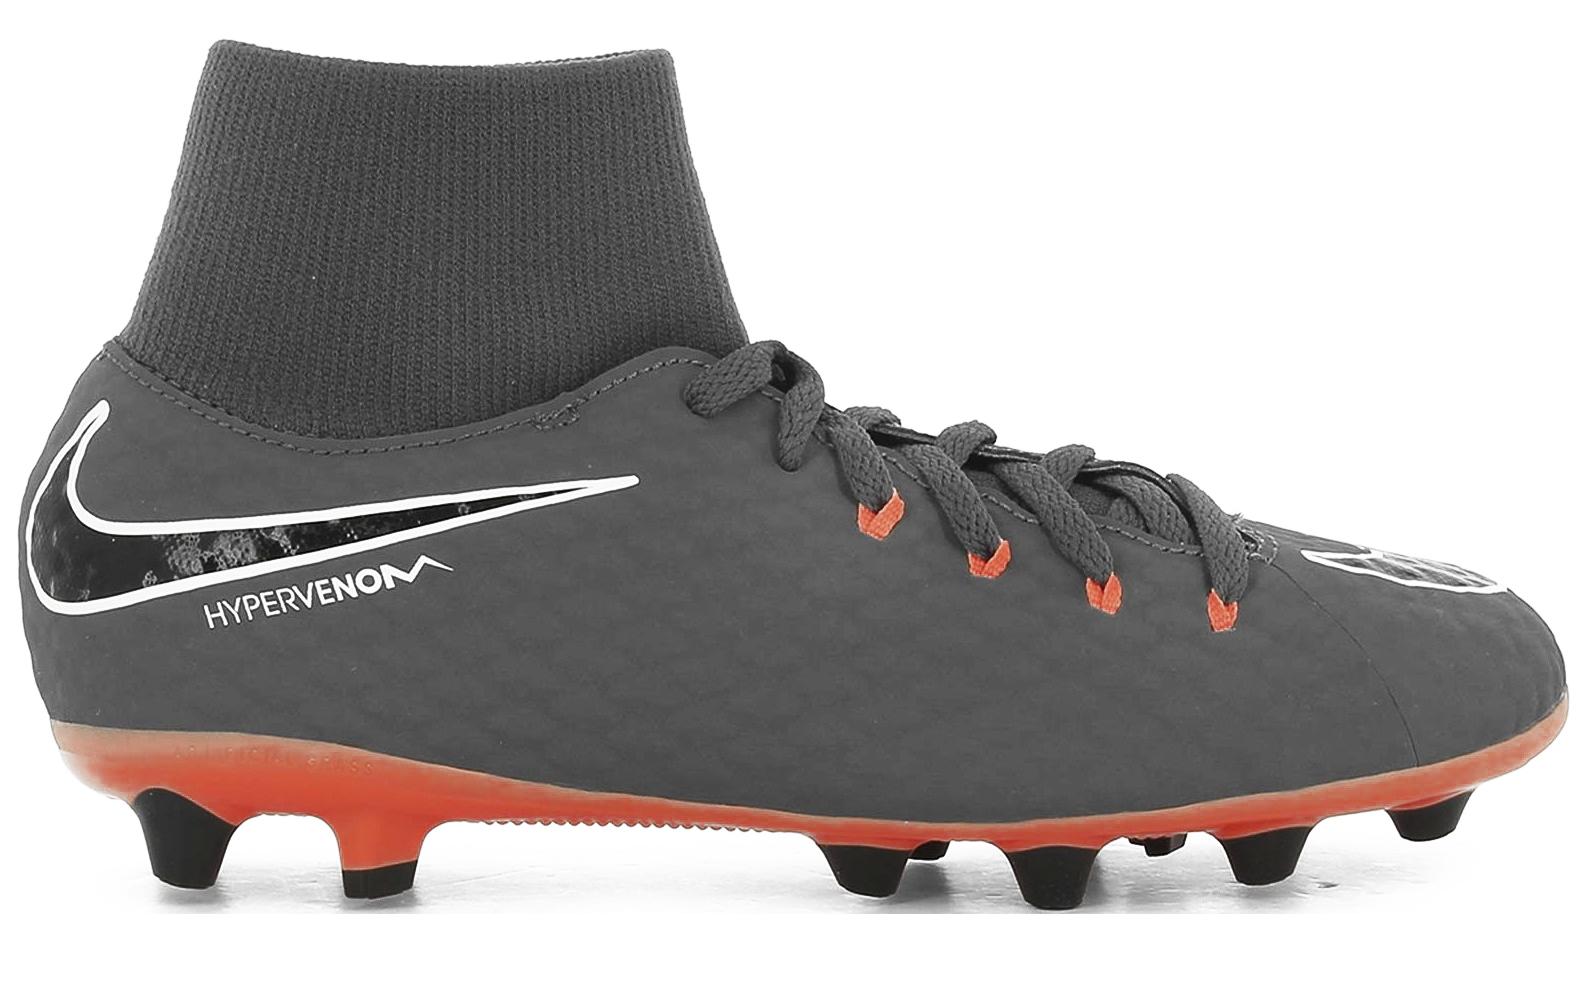 5a7d893abe Soccer shoes Child Nike Hypervenom Phantom III Academy AG Pro Fast AF Pack  colore Grey Orange - Nike - SportIT.com